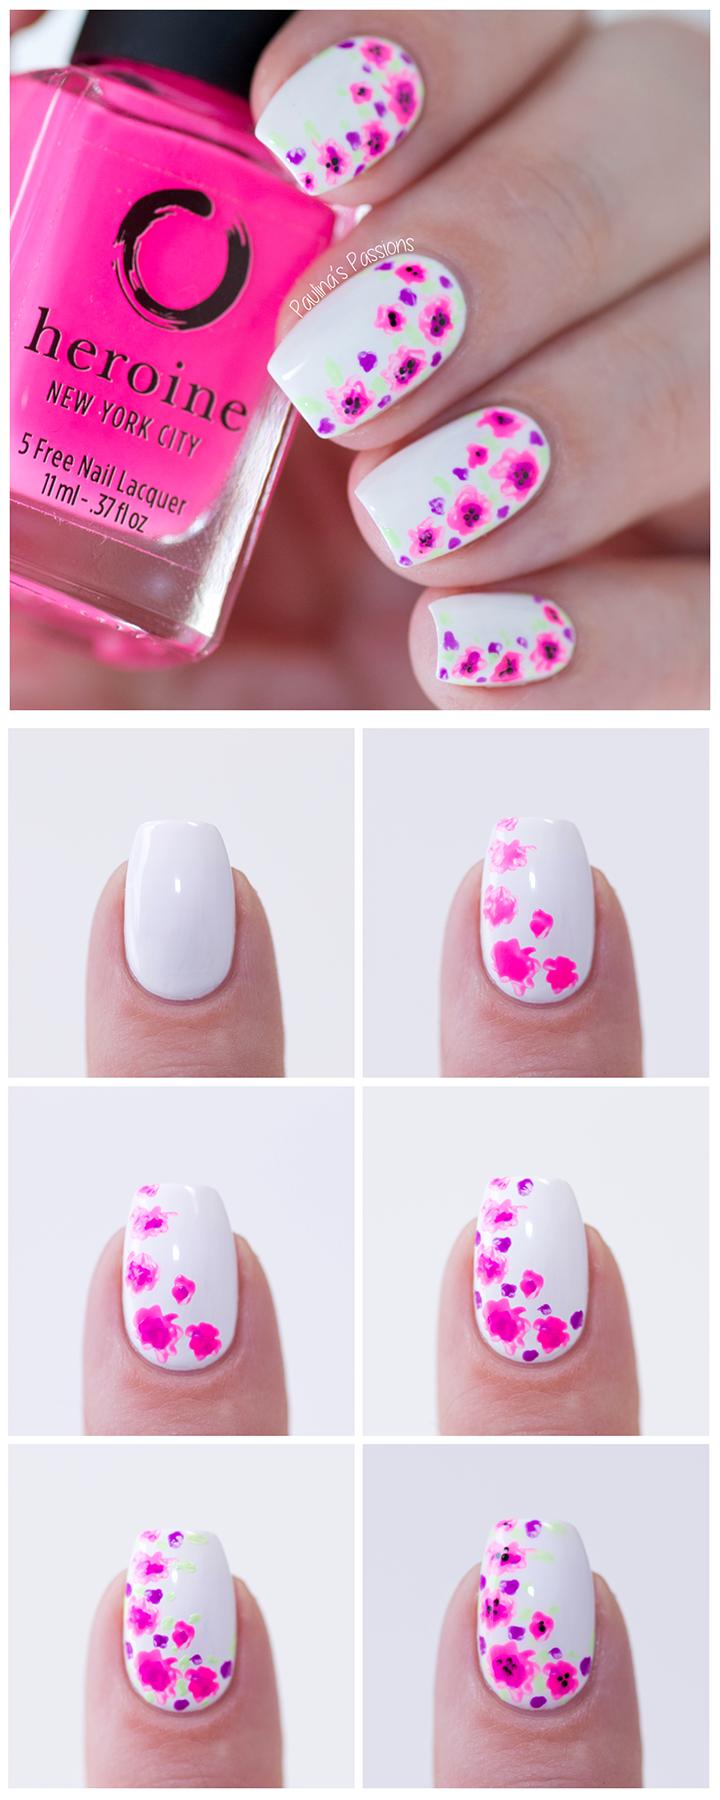 Paulinaus passionsguest post at heroine nyc blog floral nails